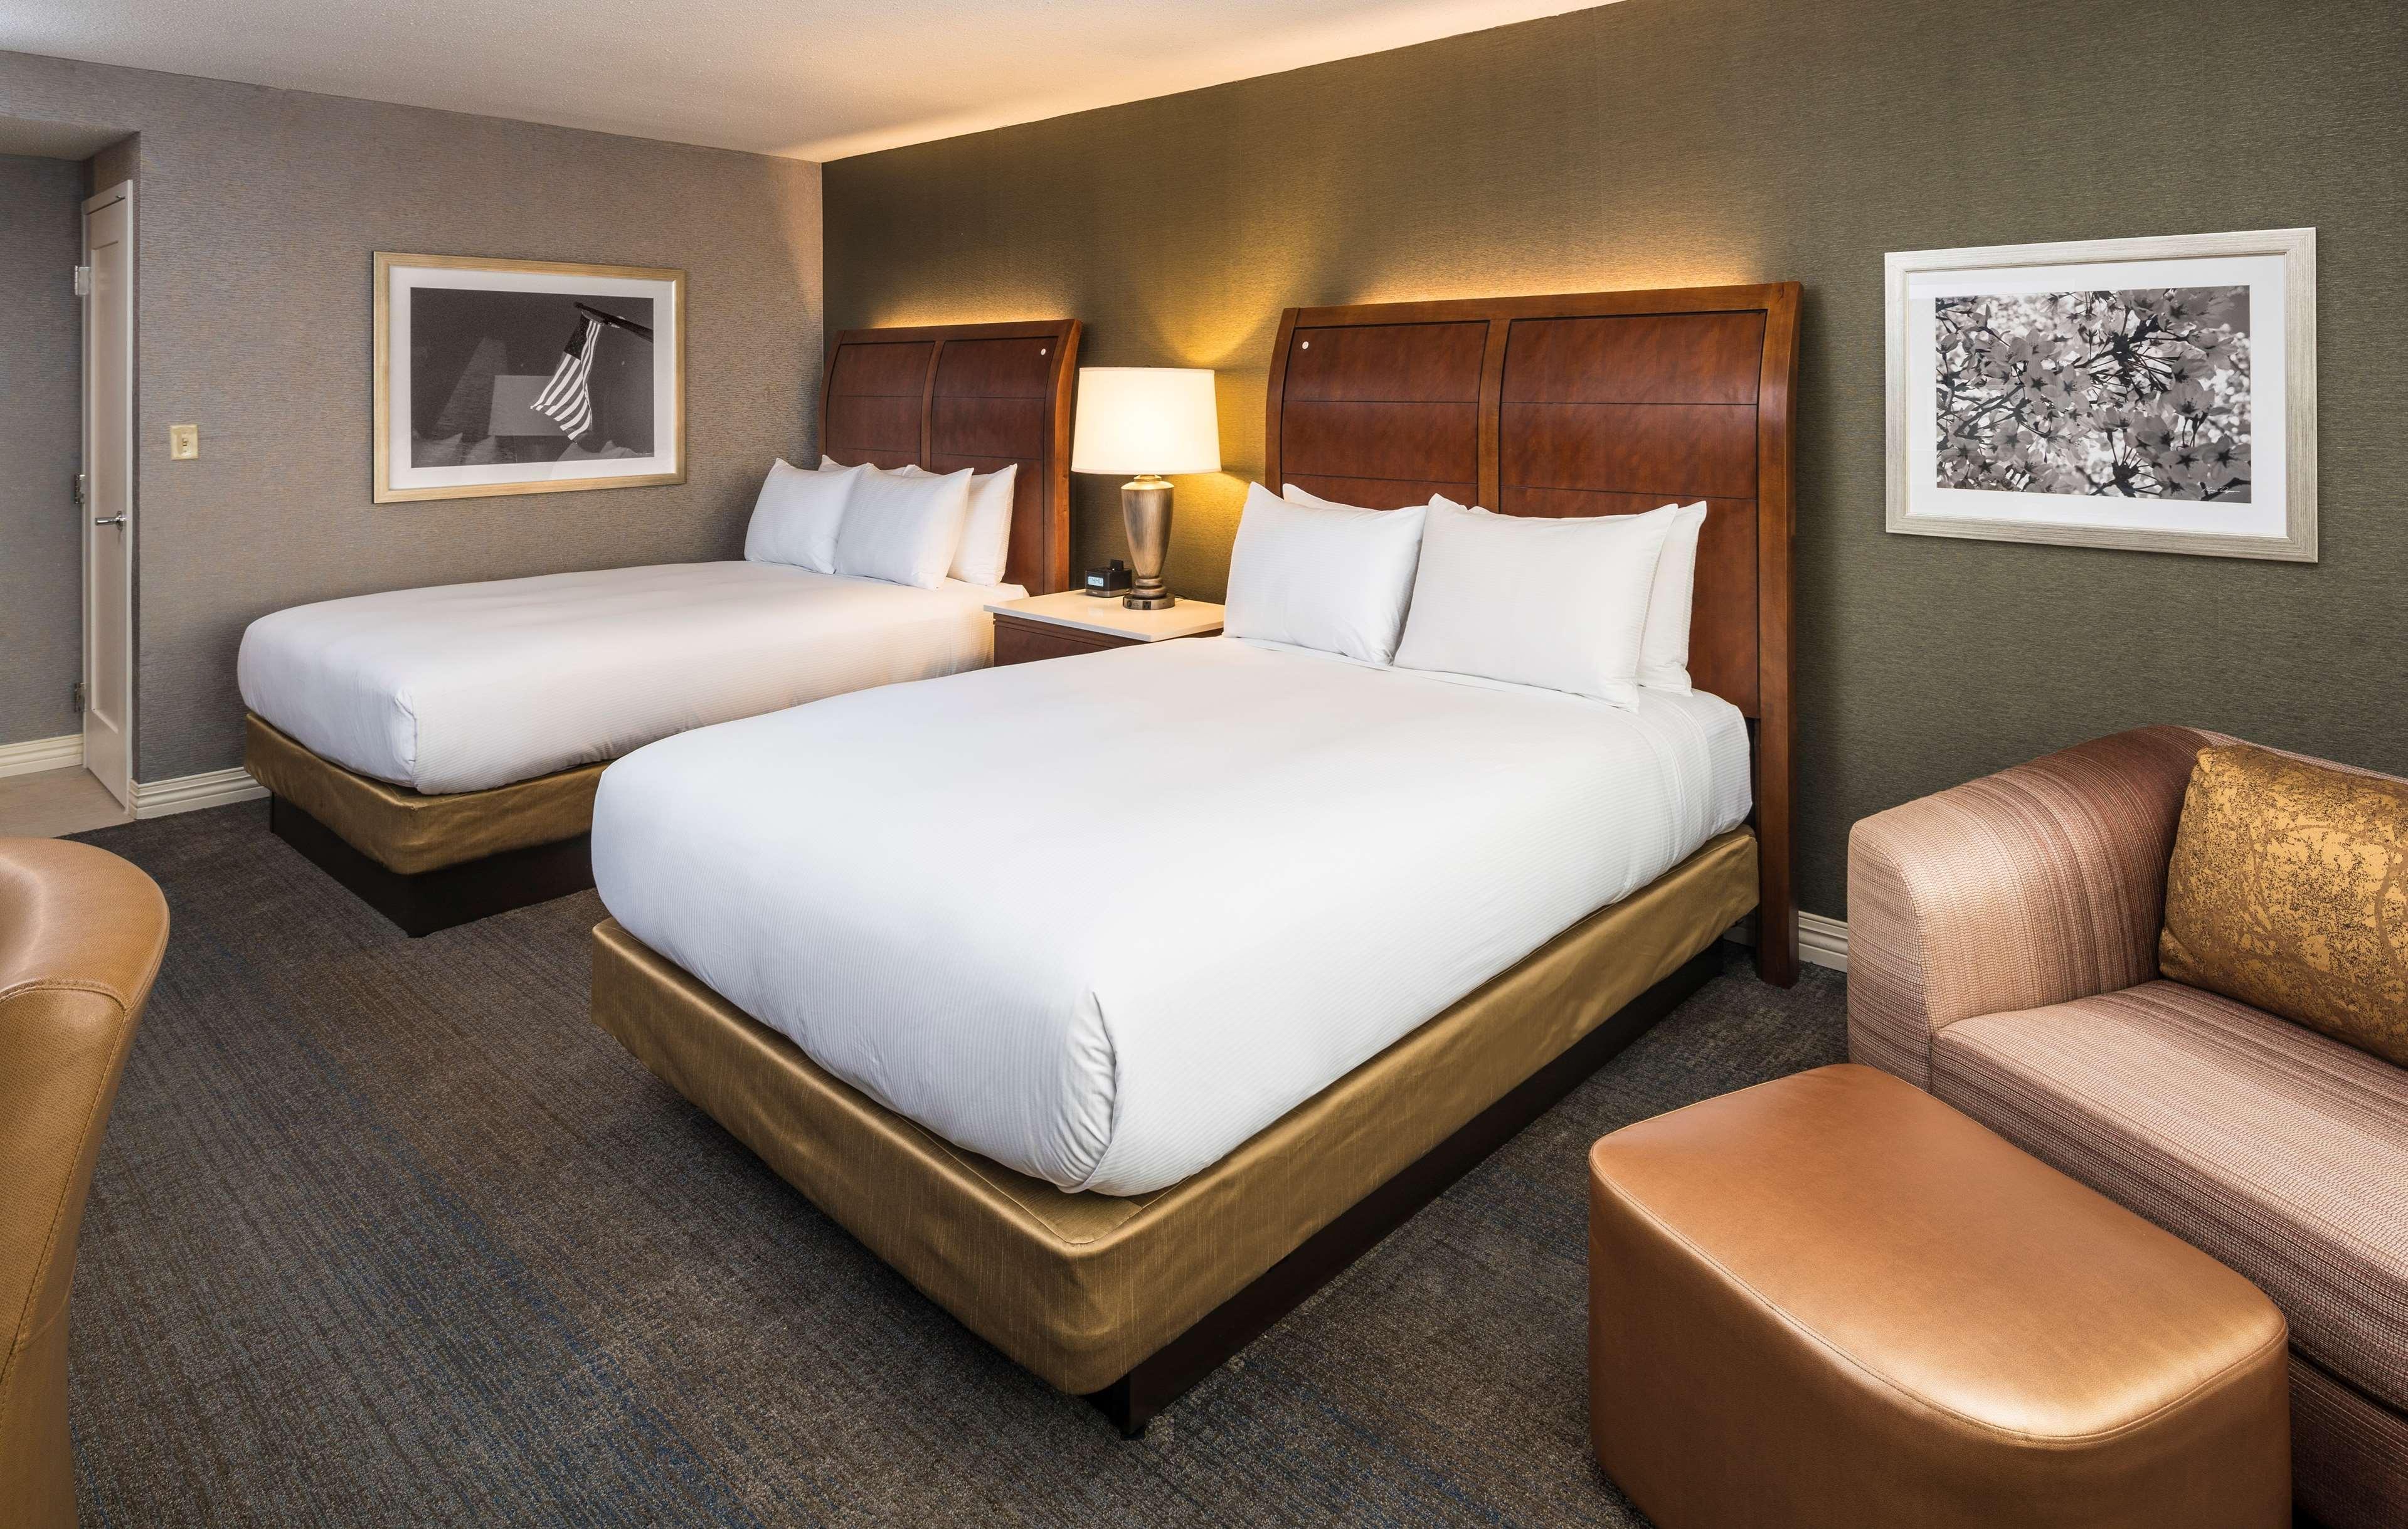 Hilton Washington DC/Rockville Hotel & Executive Meeting Ctr image 43